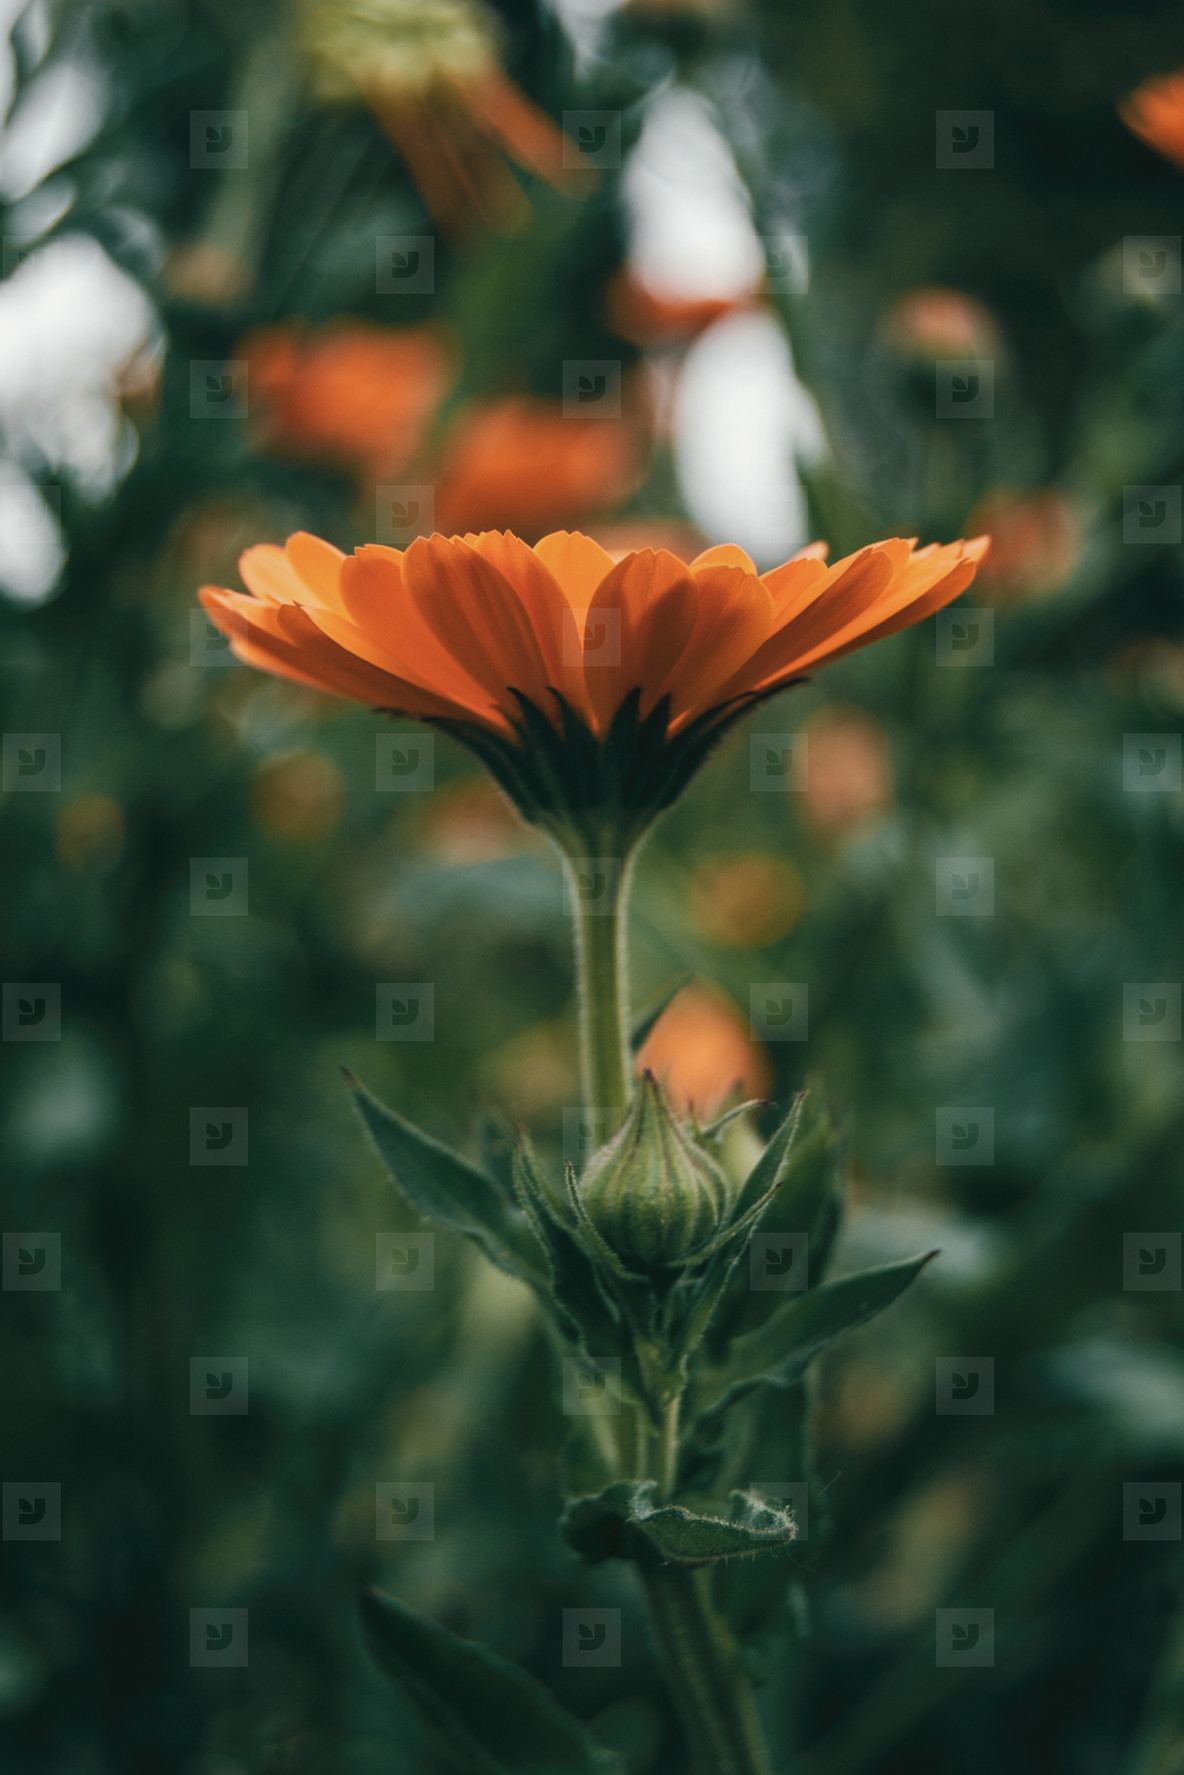 a single orange flower of calendula officinalis seen from below